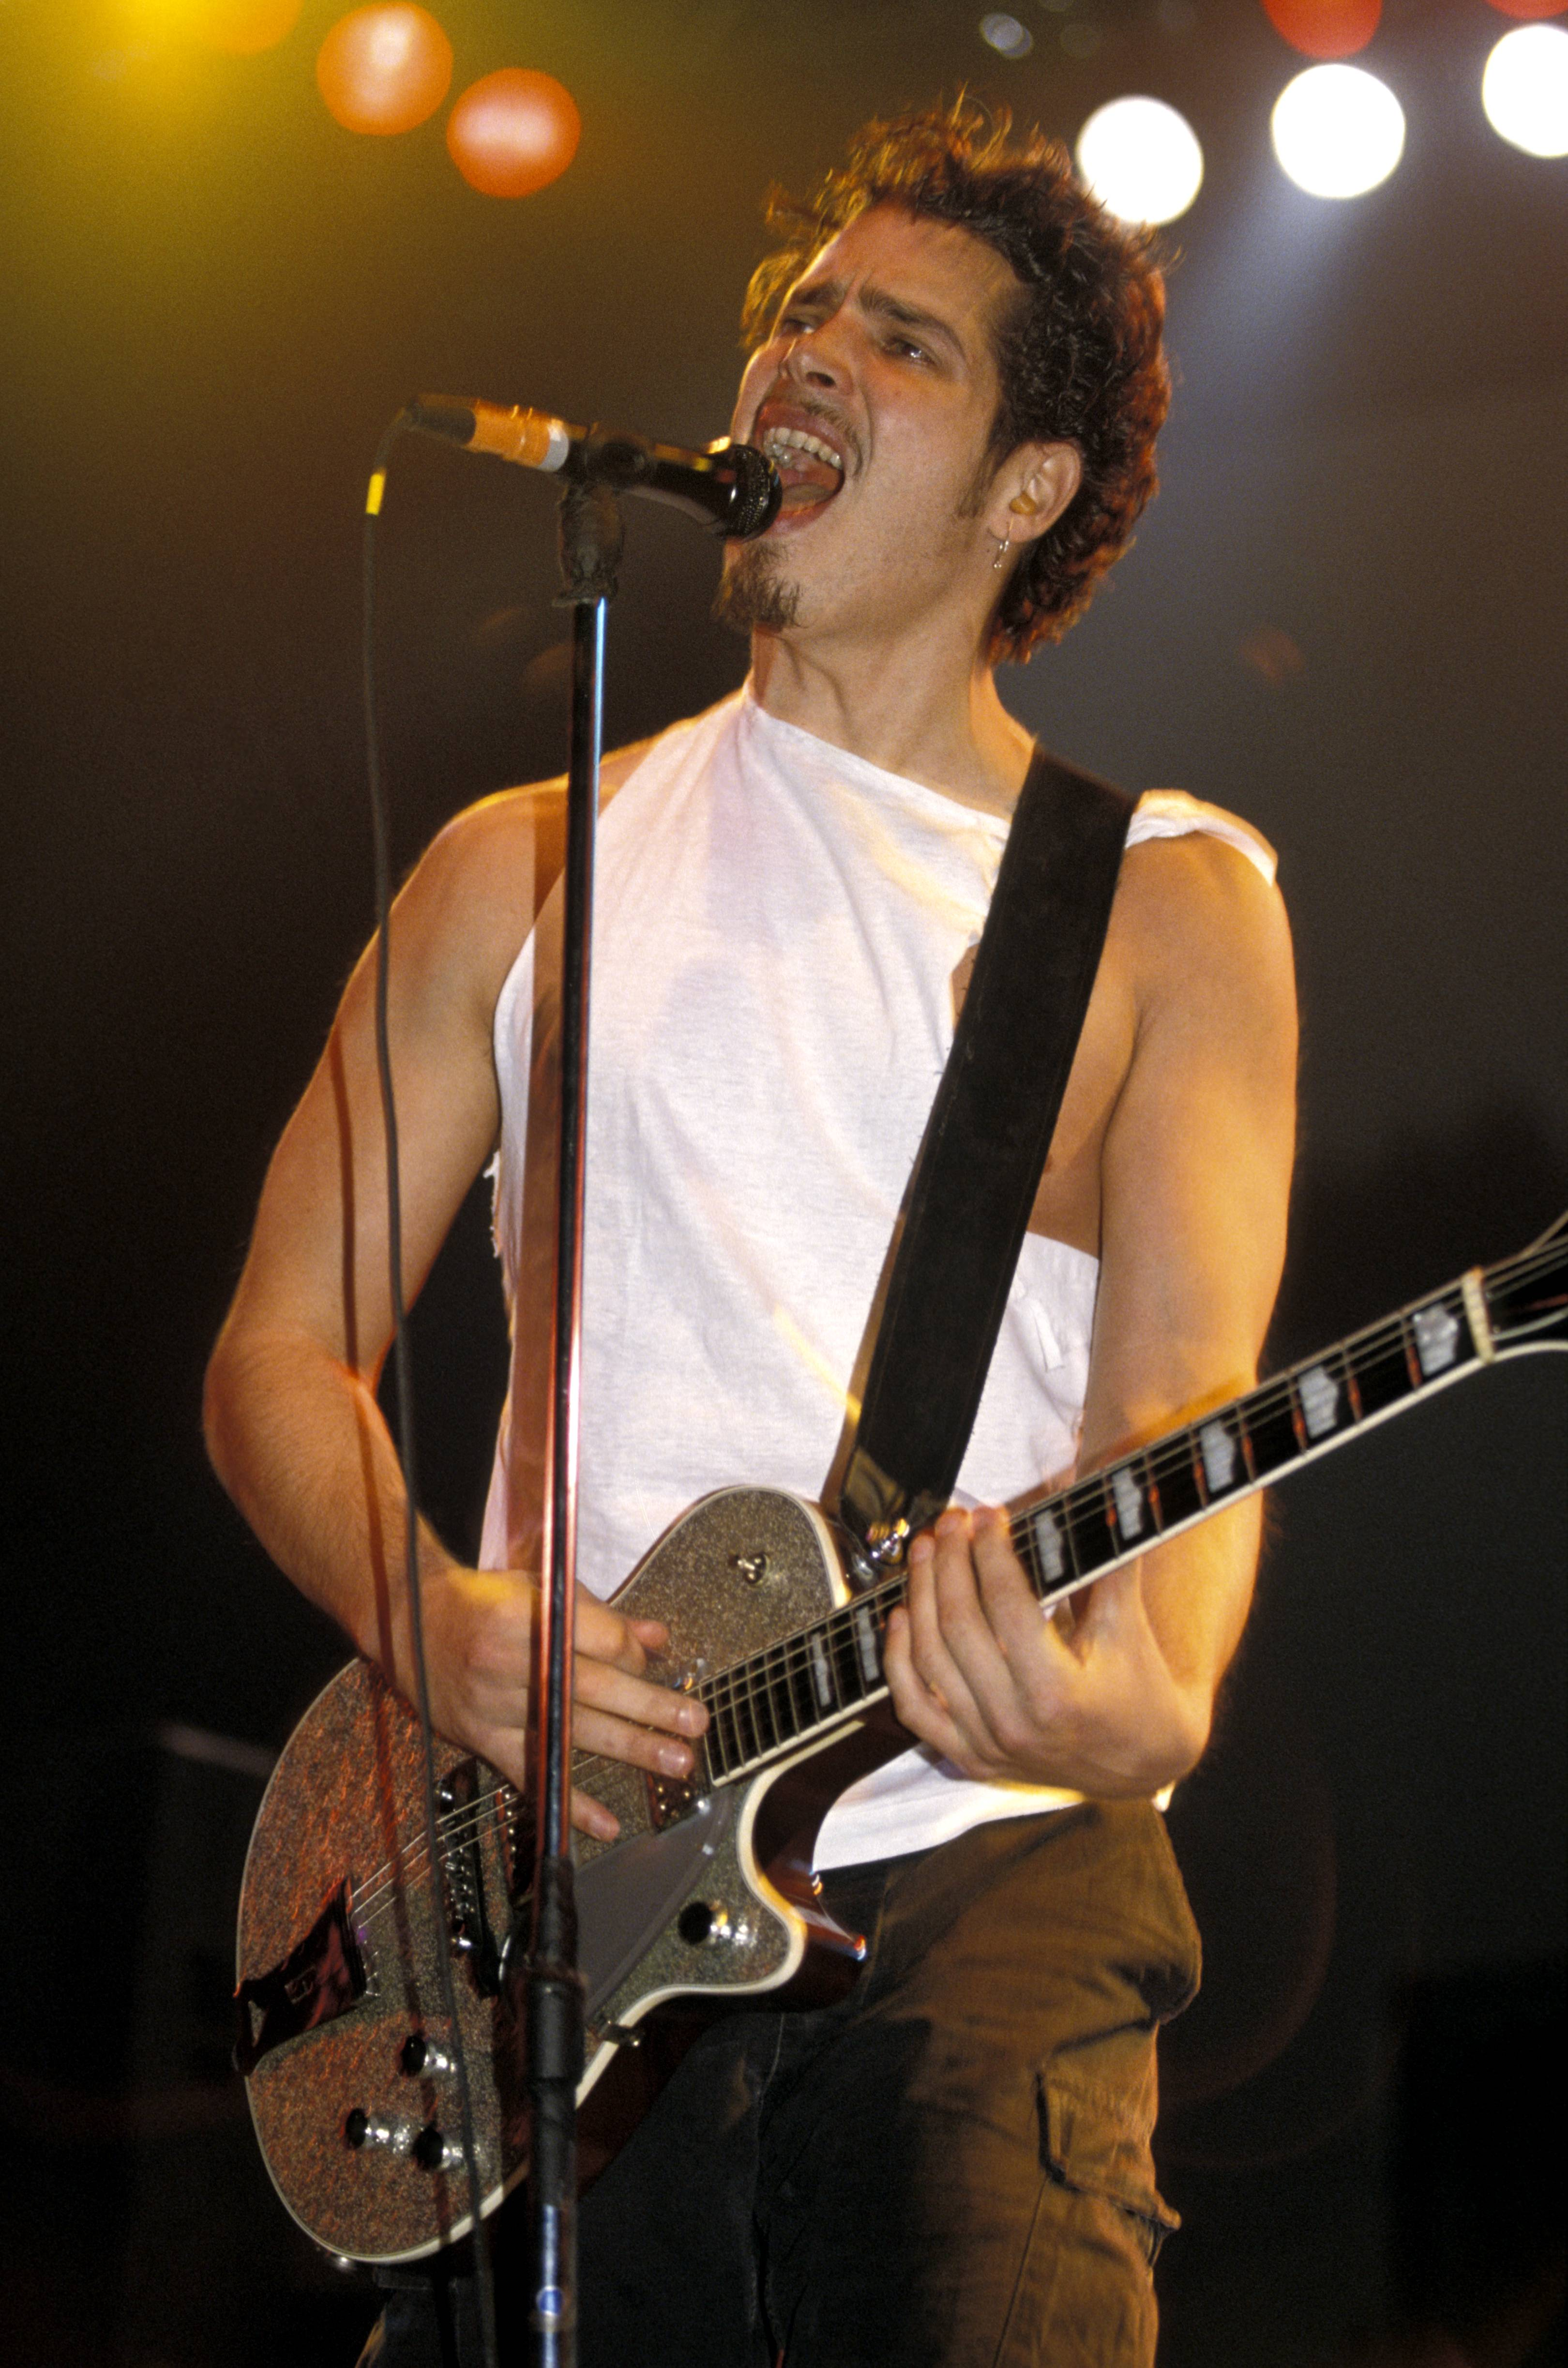 Kim Rodriguez (b. 1994)